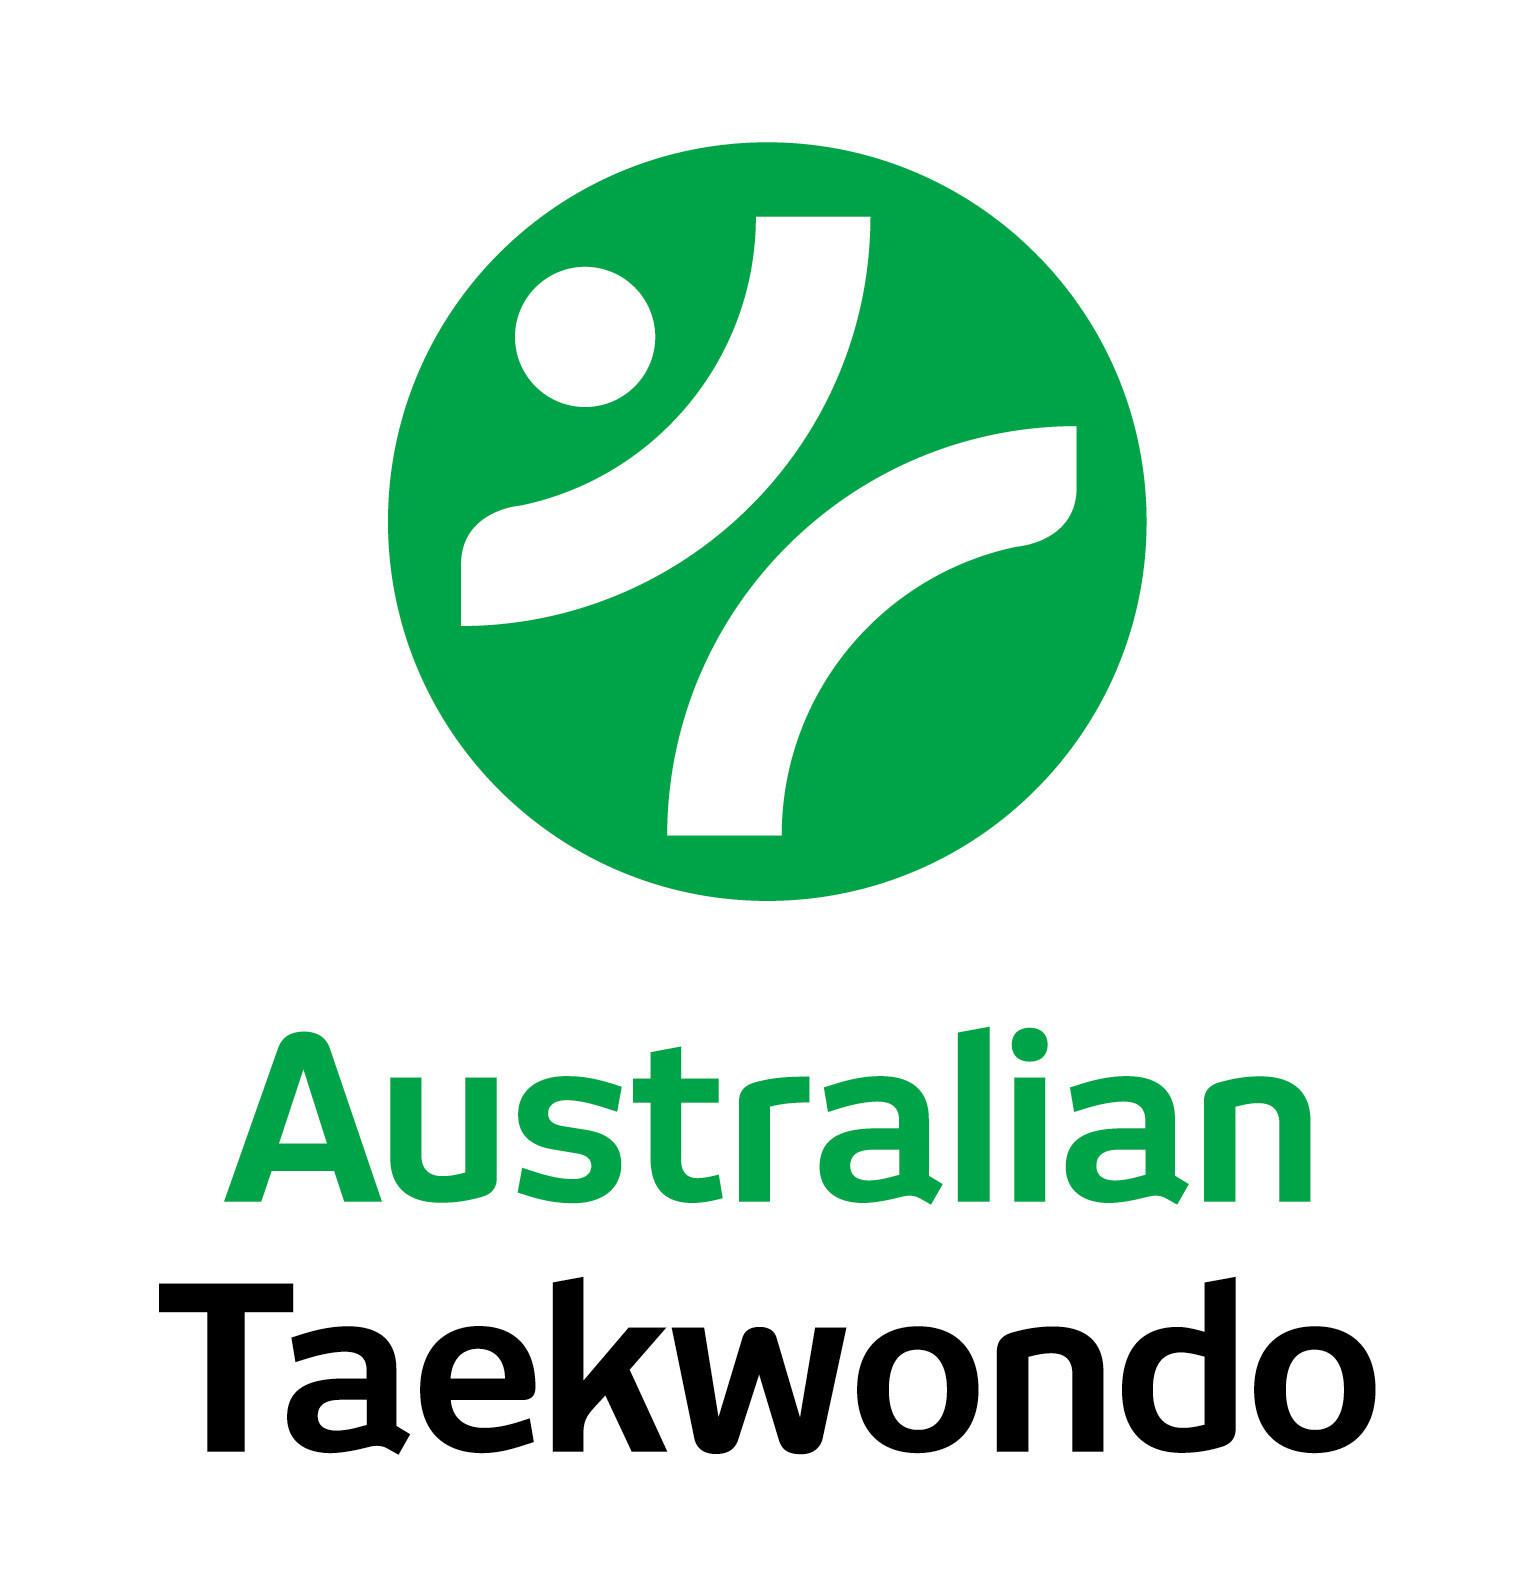 Australian Taekwondo appoints Meyers as media liaison